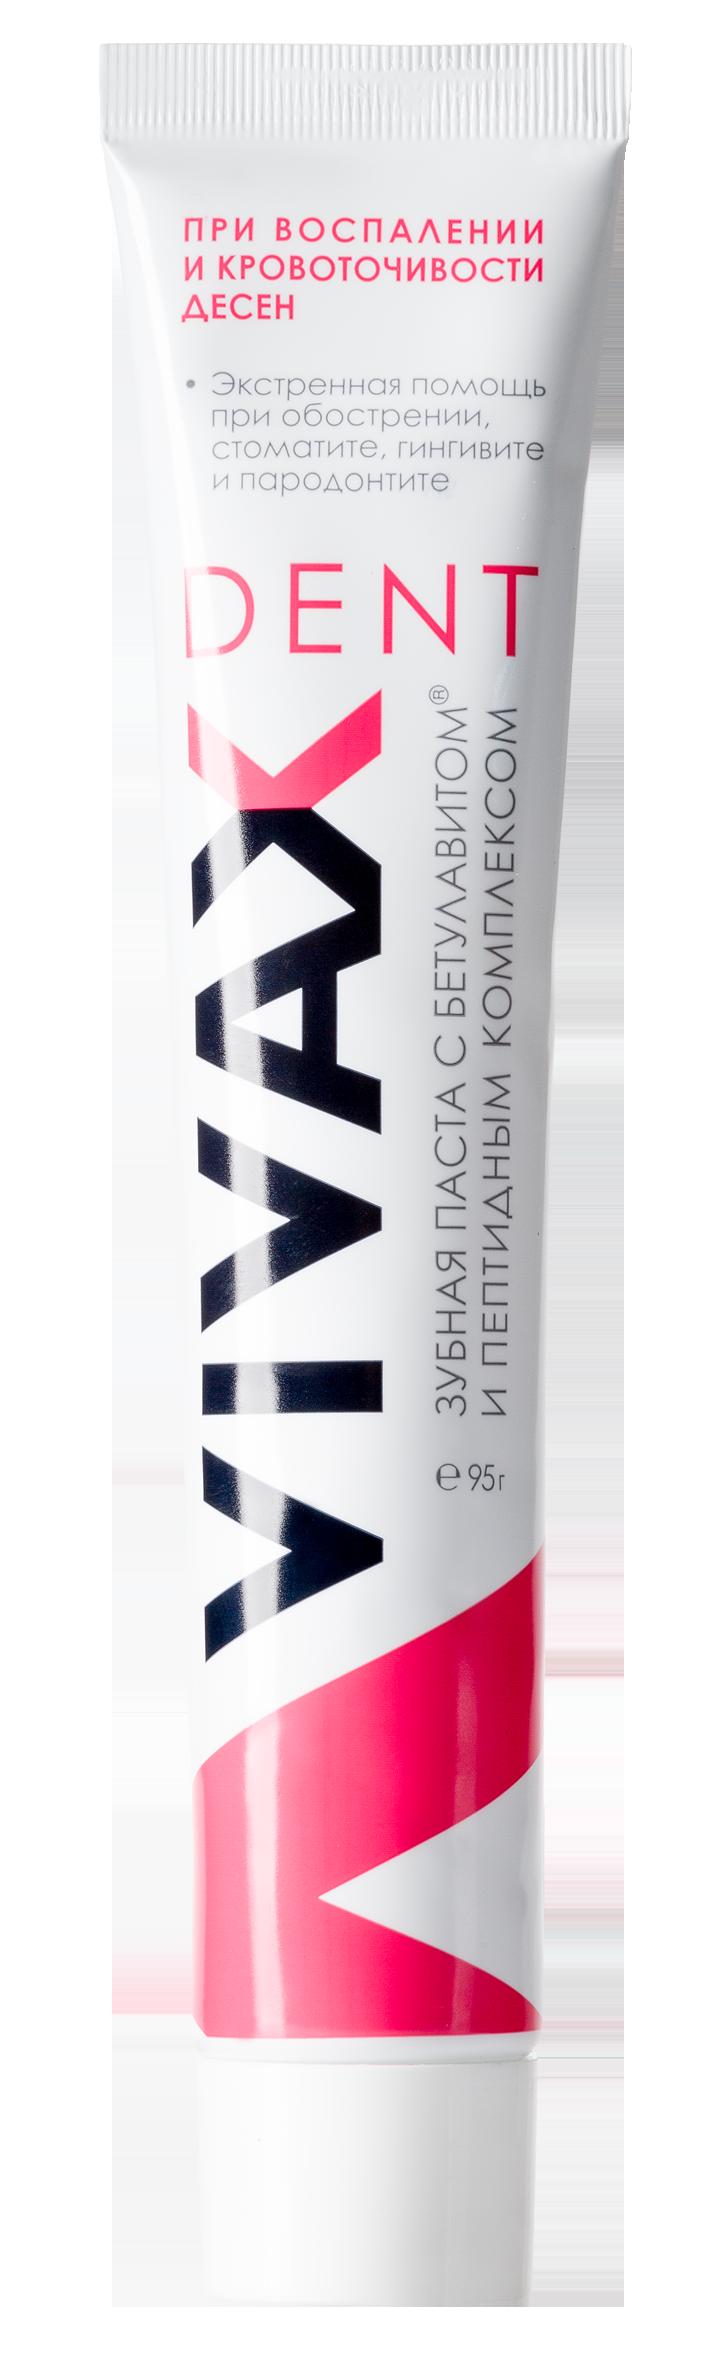 VIVAX Паста зубная с Бетулавитом / VIVAX Dent 95 мл